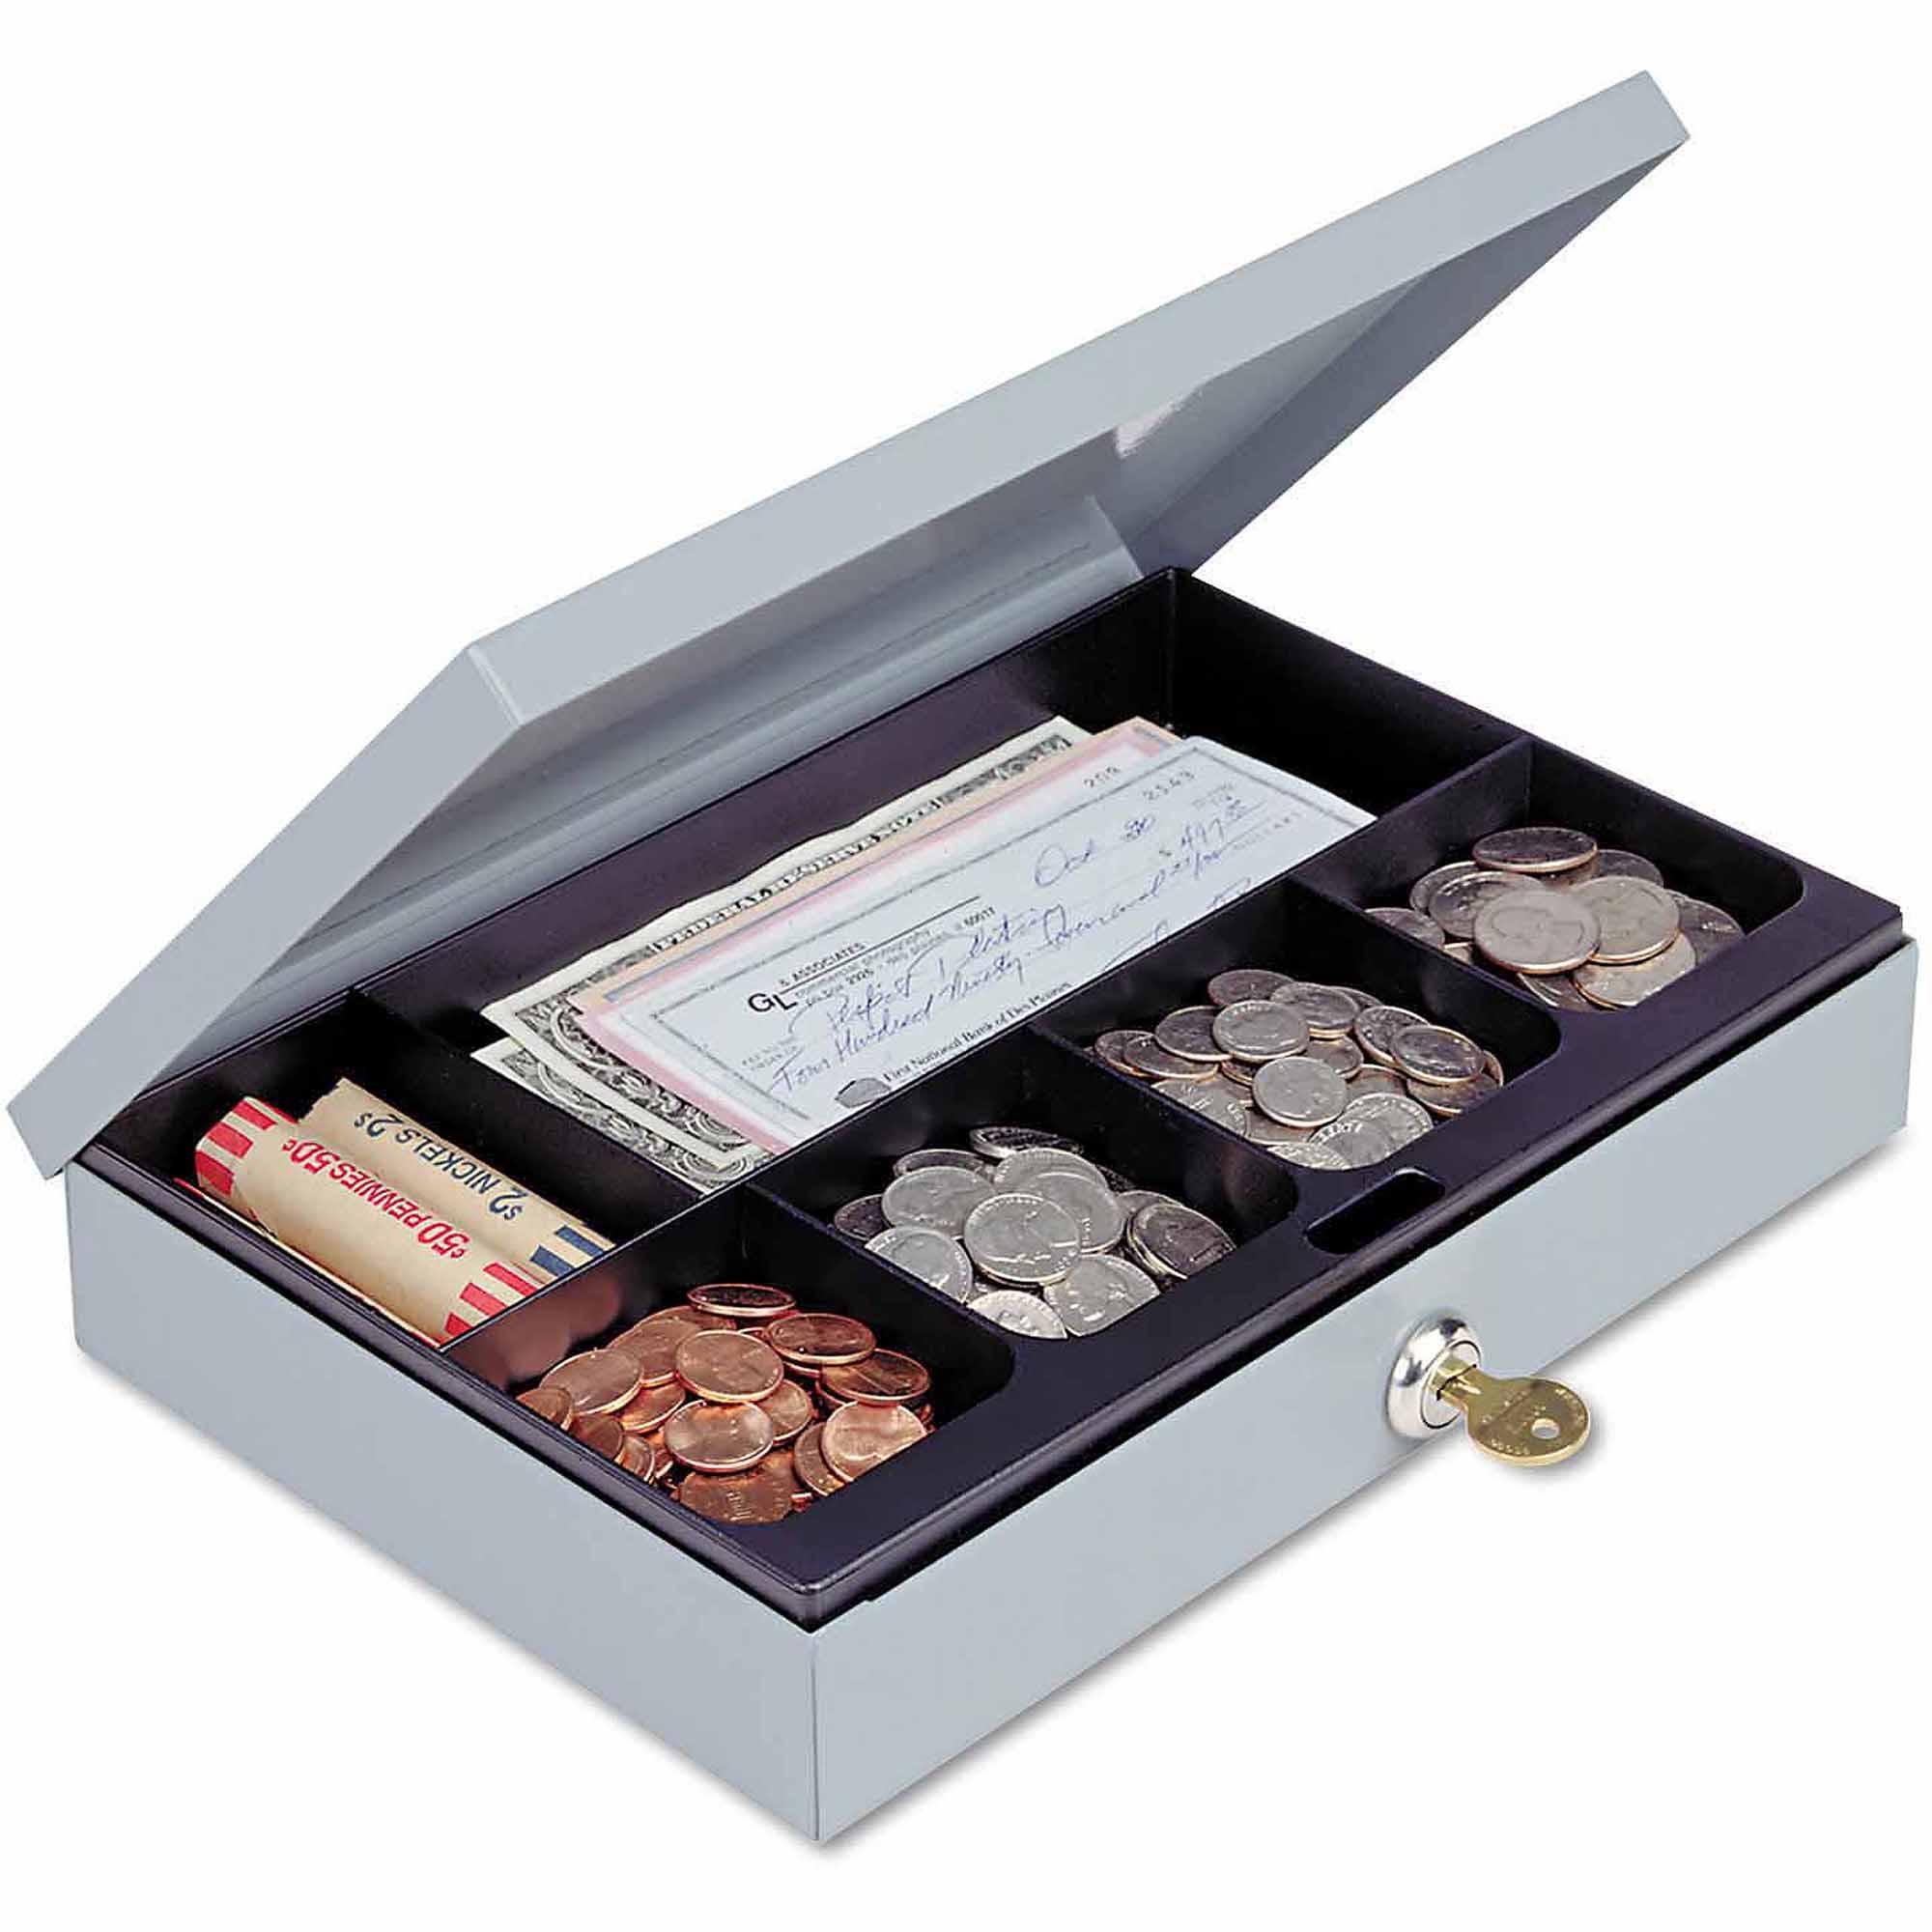 SteelMaster Heavy-Duty Steel Low-Profile Cash Box with 6 Compartments, Key Lock, Grey